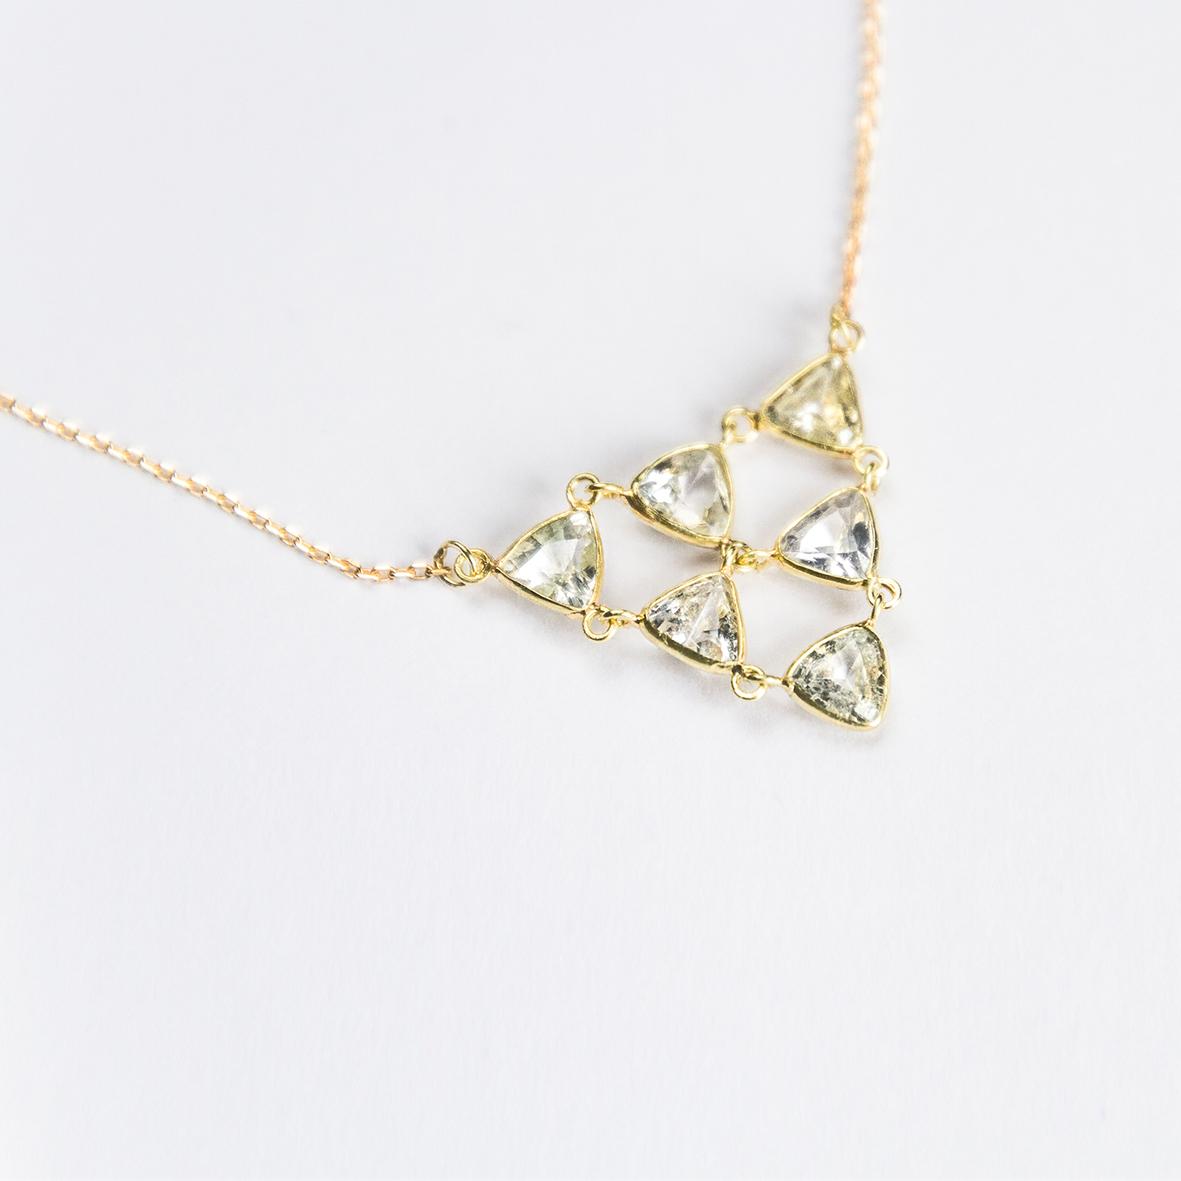 1. OONA_philo_principal_sapphire triangles cascade necklace